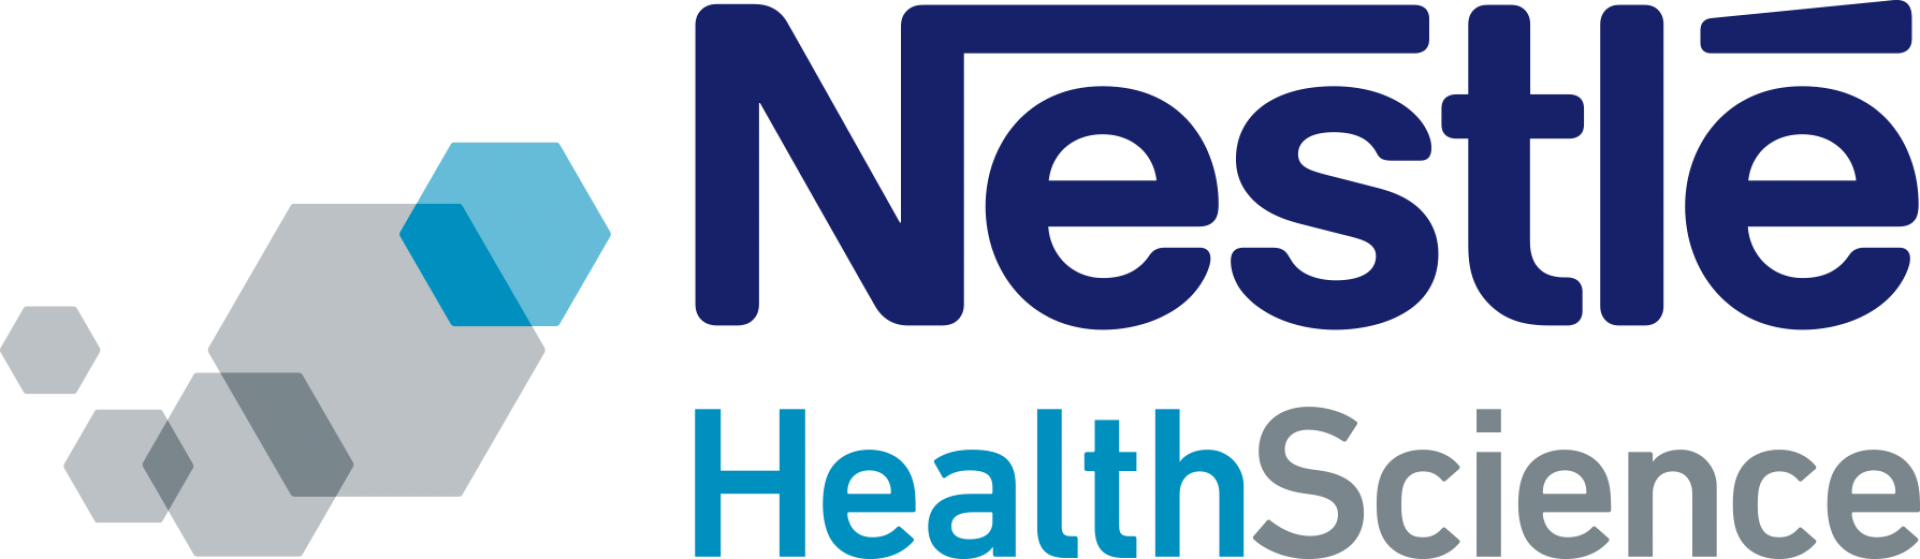 Nestle Health Science logo